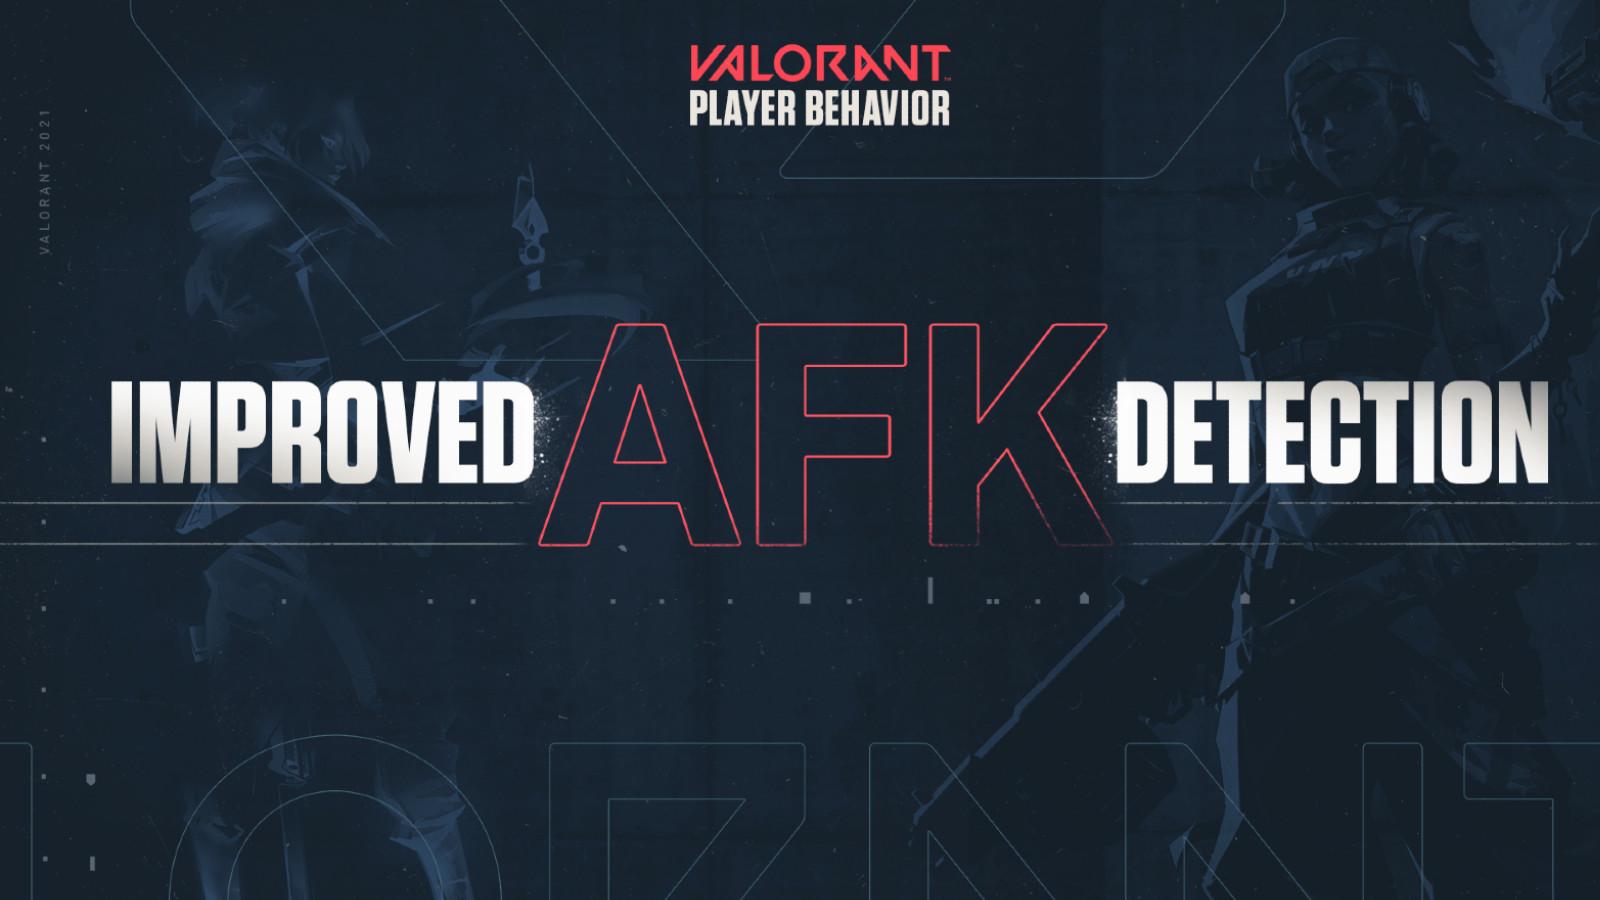 Valorant AFK detection